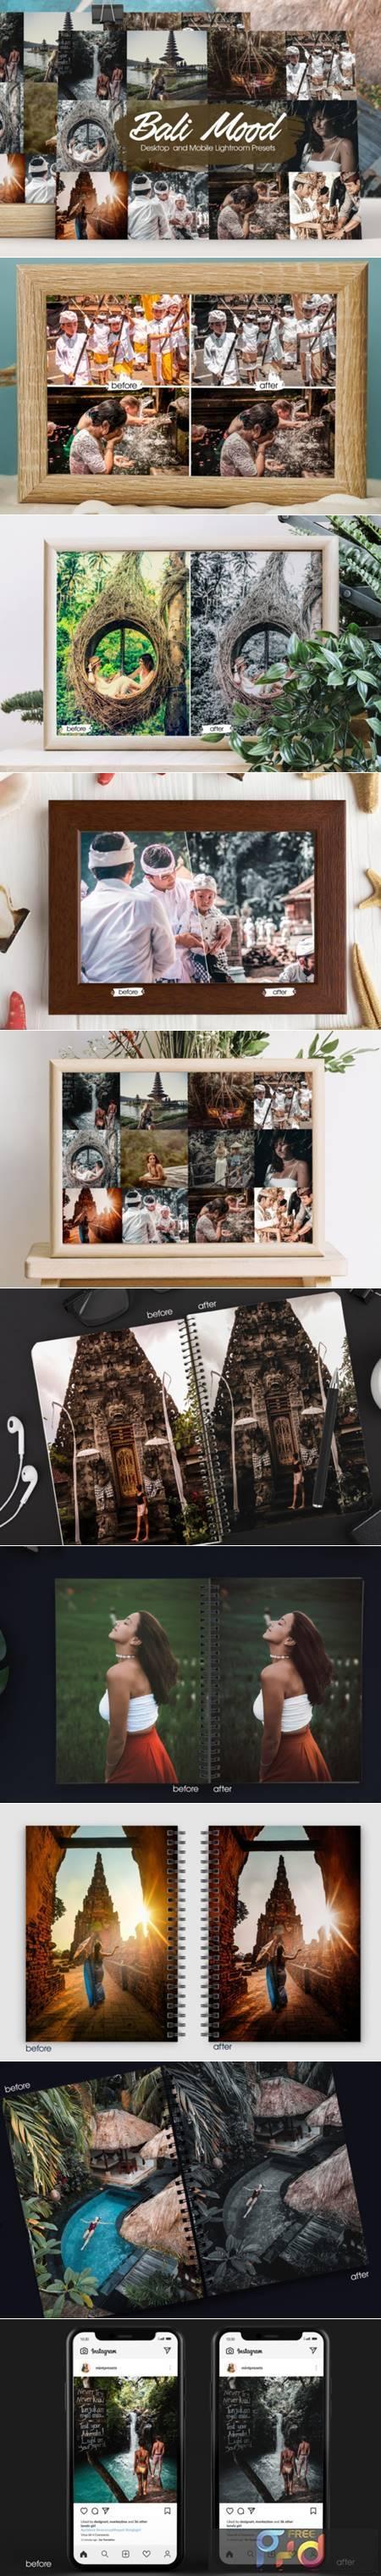 Bali Mood Lightroom Presets 5489294 1